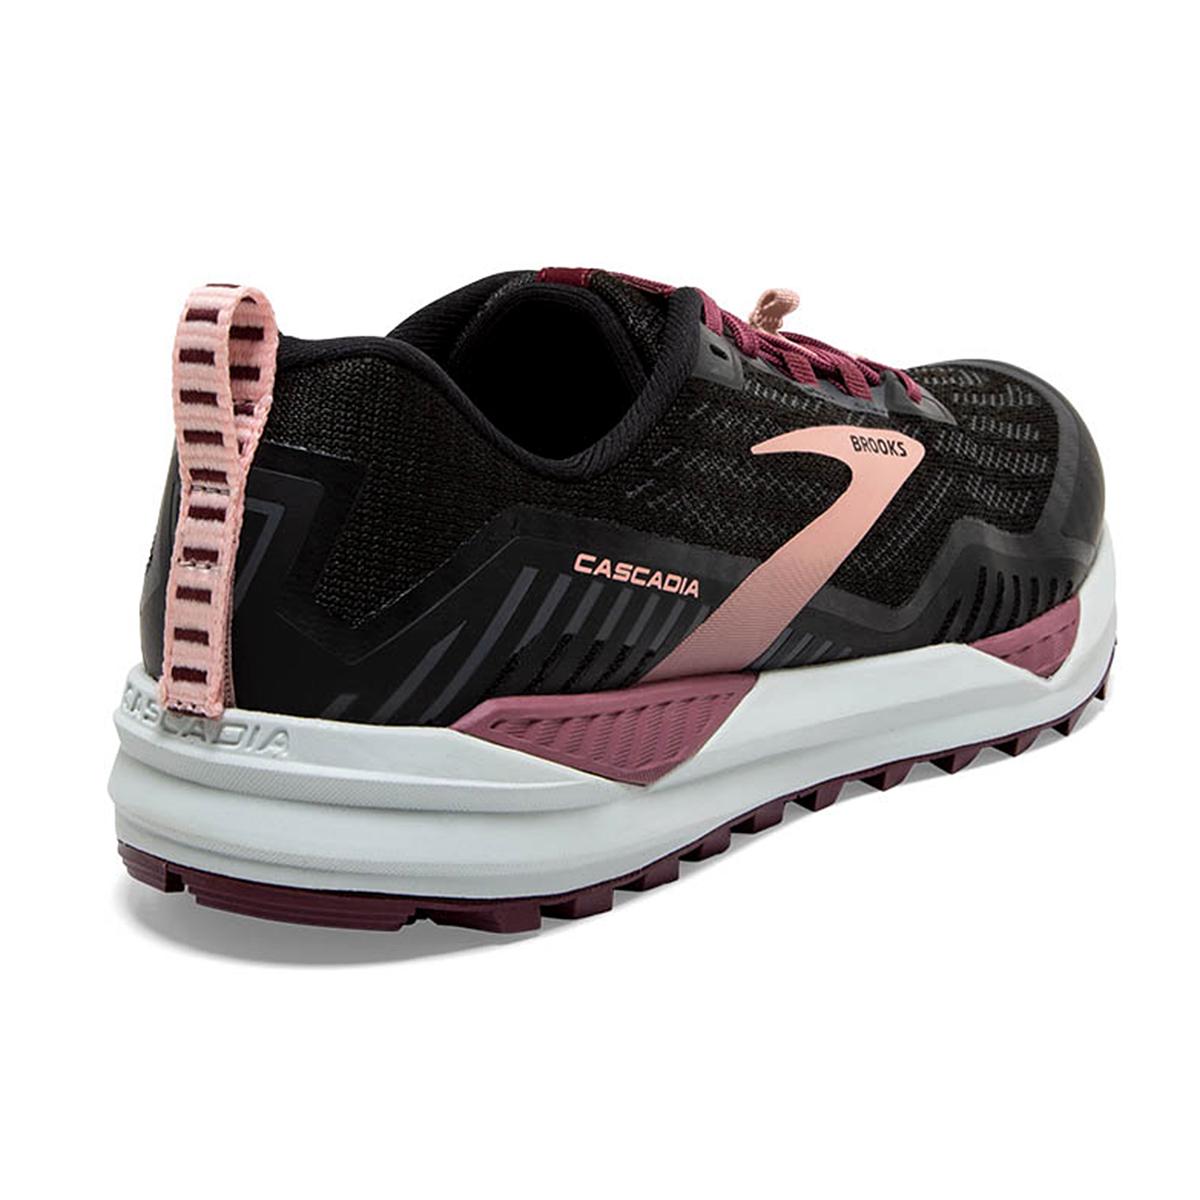 Women's Brooks Cascadia 15 Trail Running Shoe - Color: Black/Ebony/Coral - Size: 10.5 - Width: Regular, Black/Ebony/Coral, large, image 4